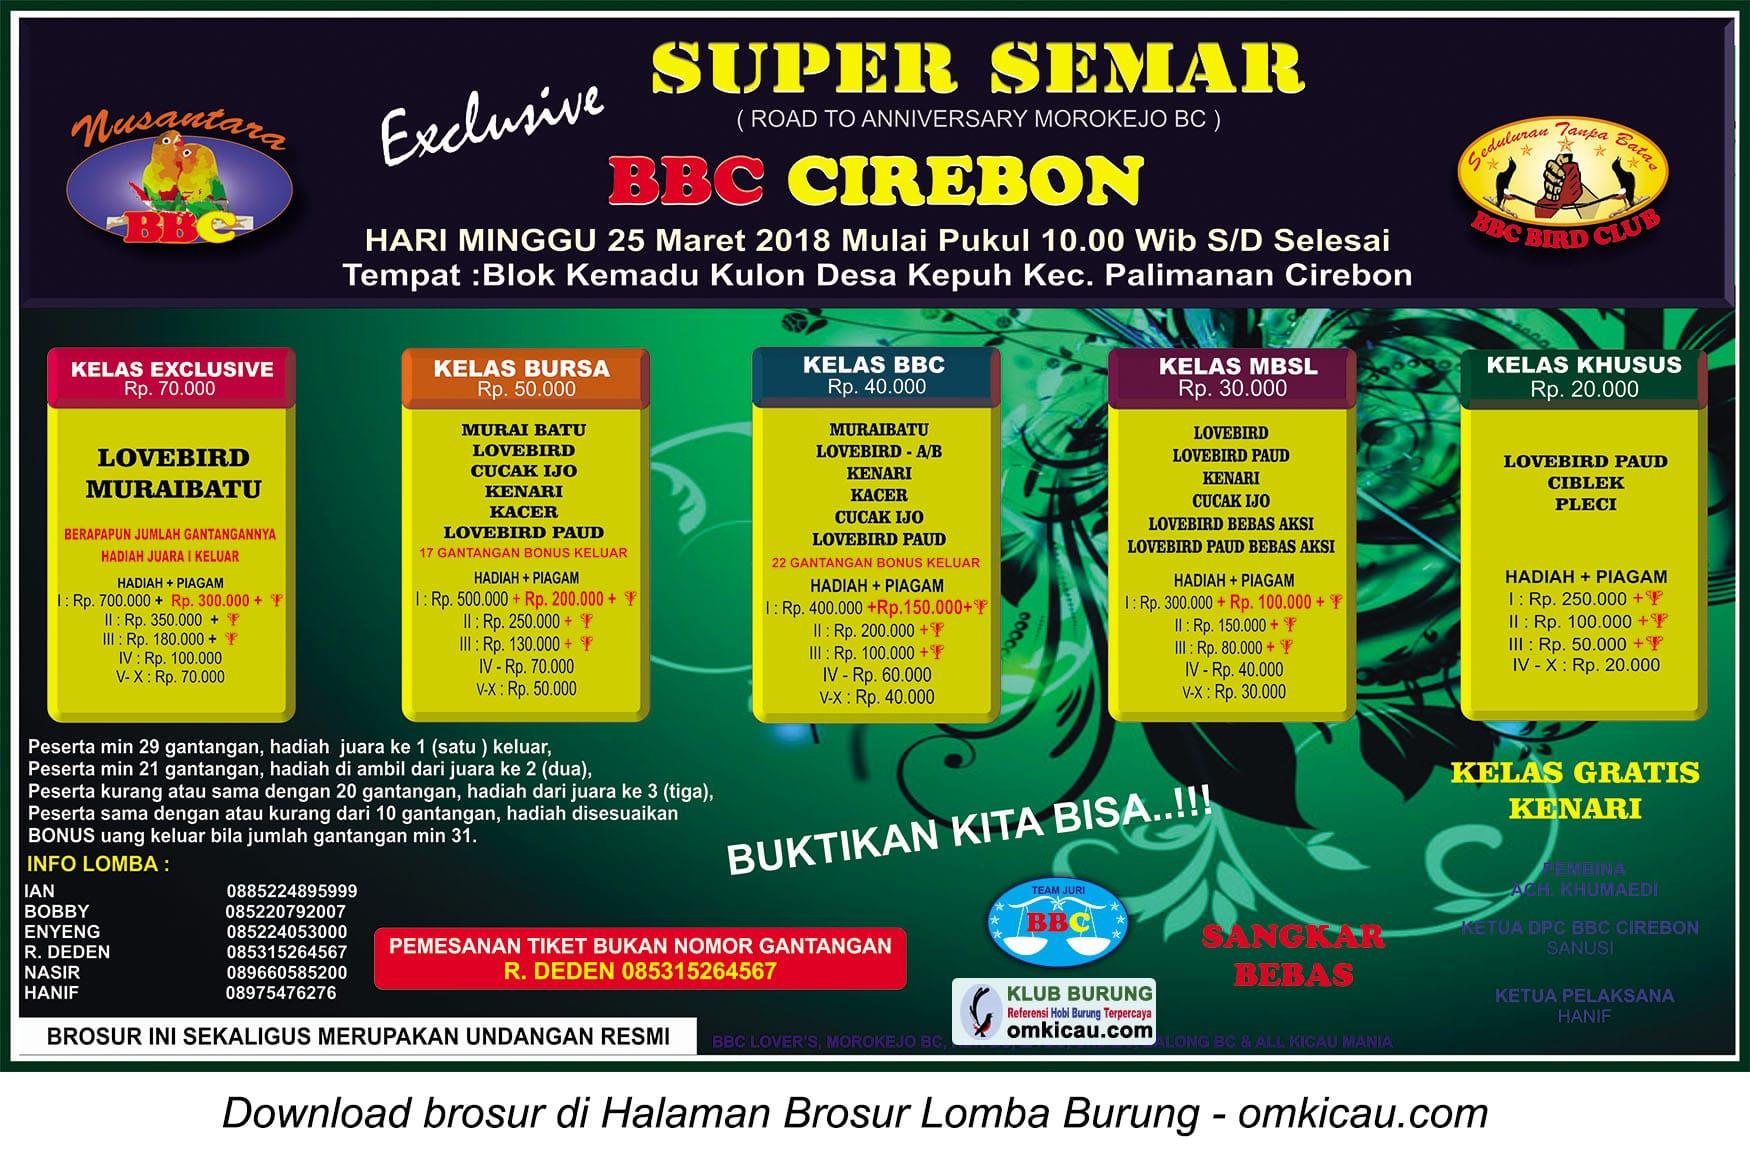 Latpres Exclusive Super Semar BBC Cirebon